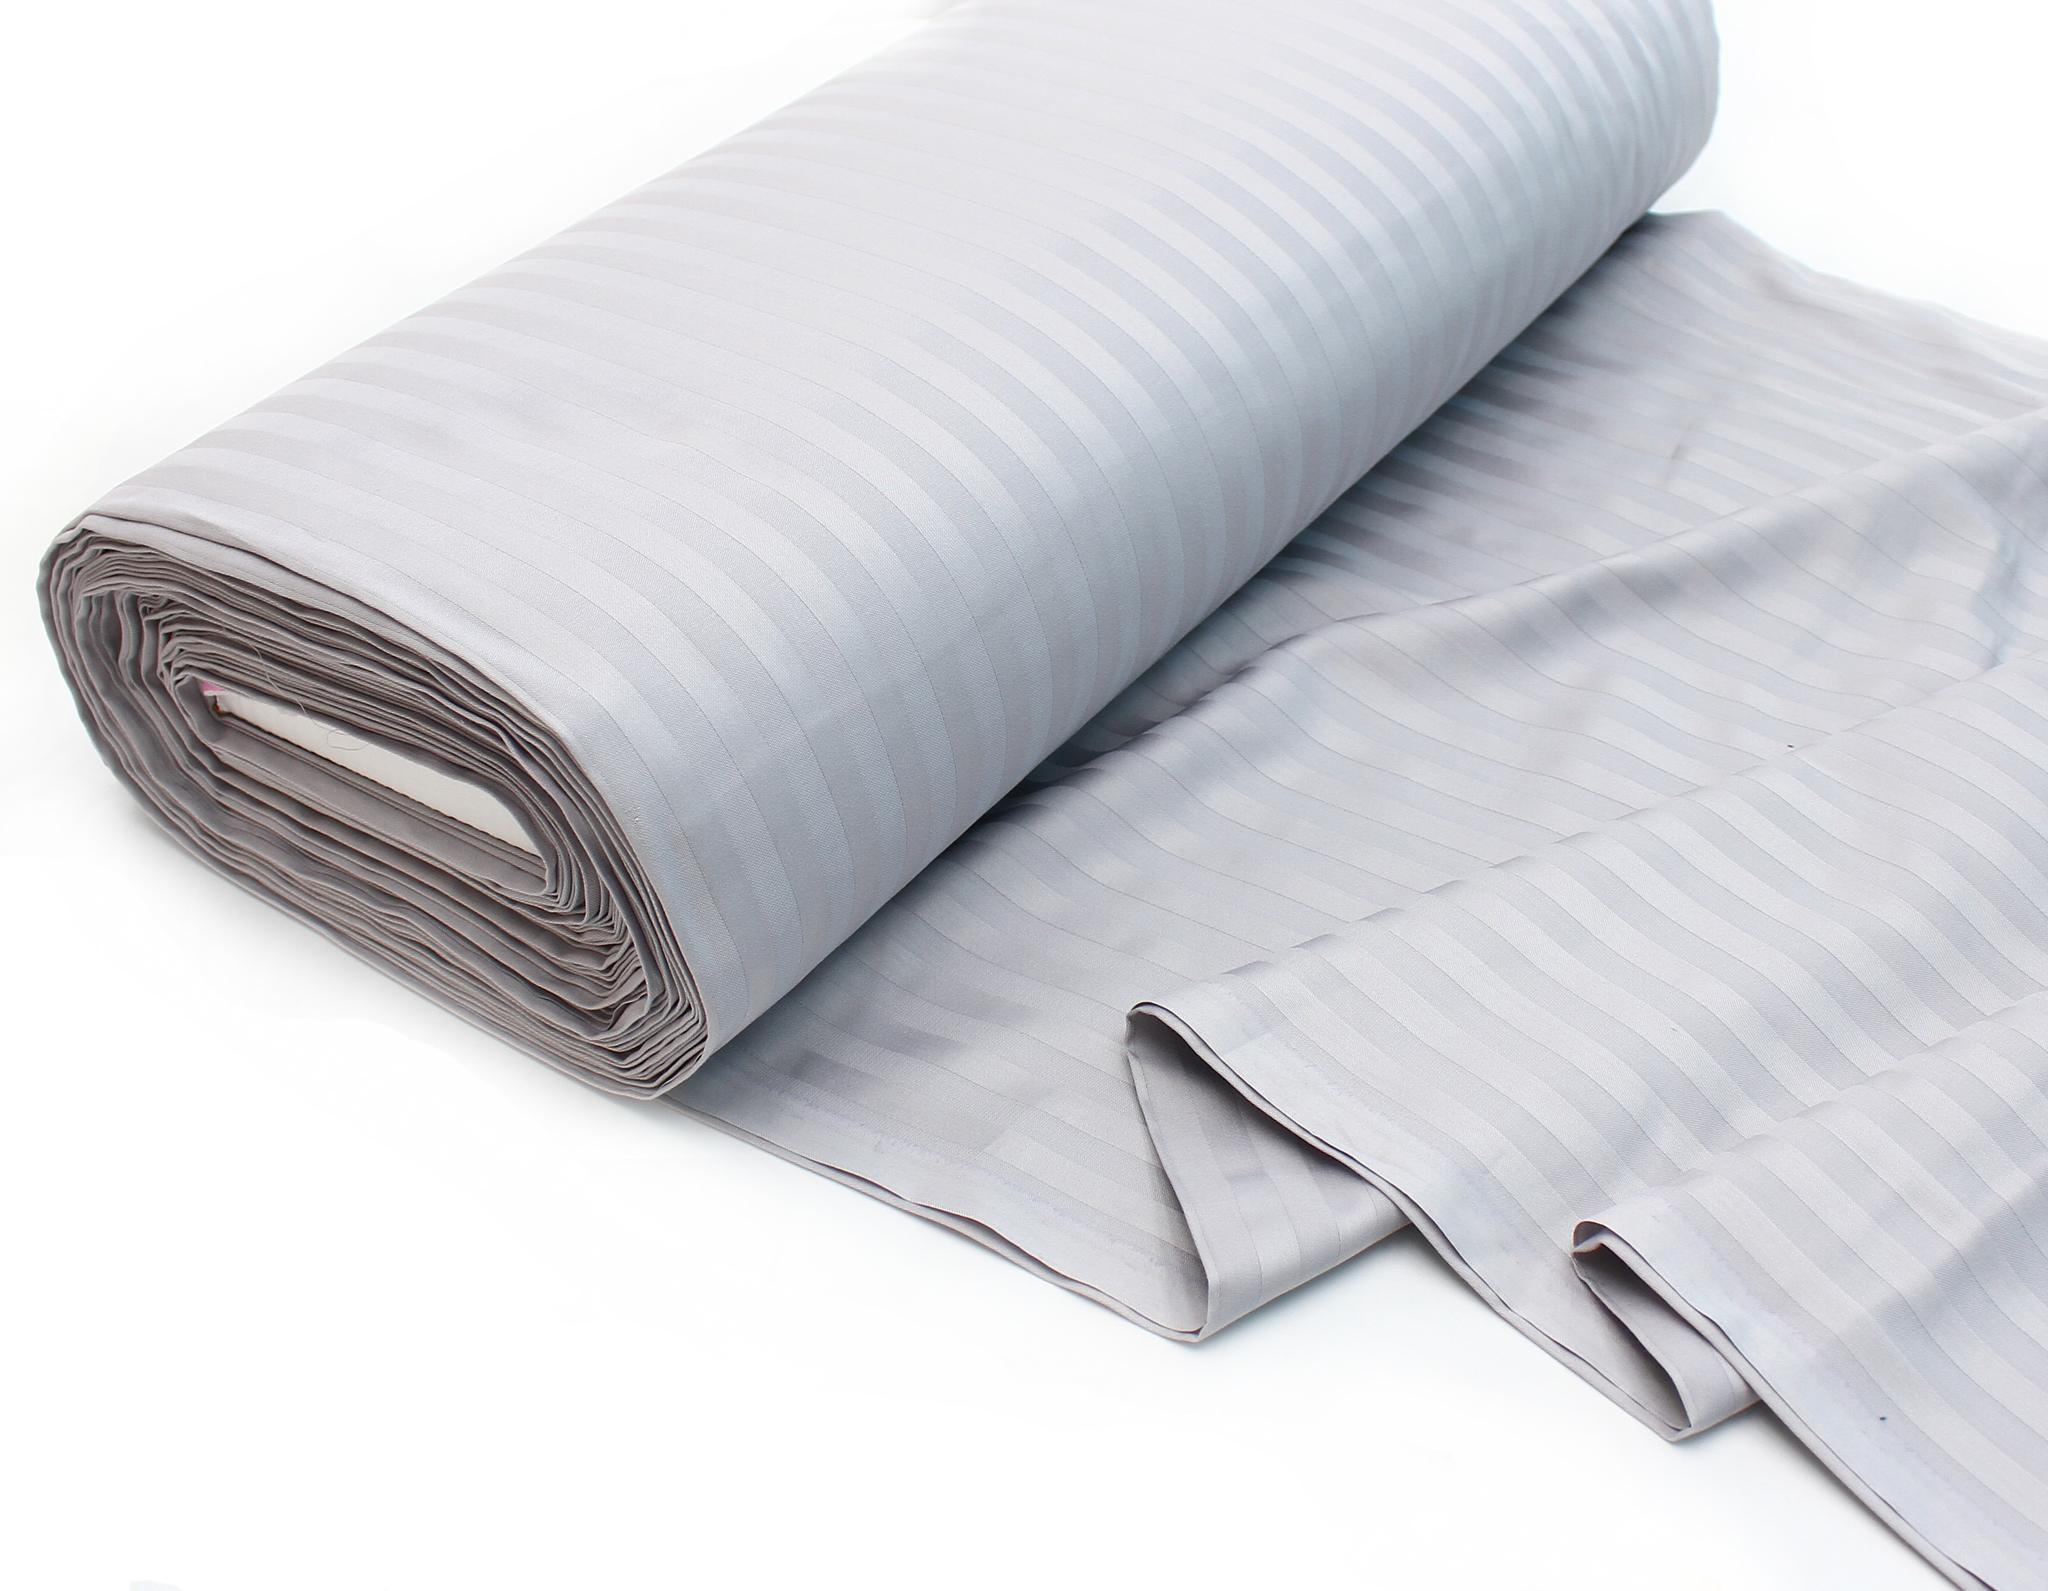 Серый,страйп (сатин класса люкс, Турция),240 см